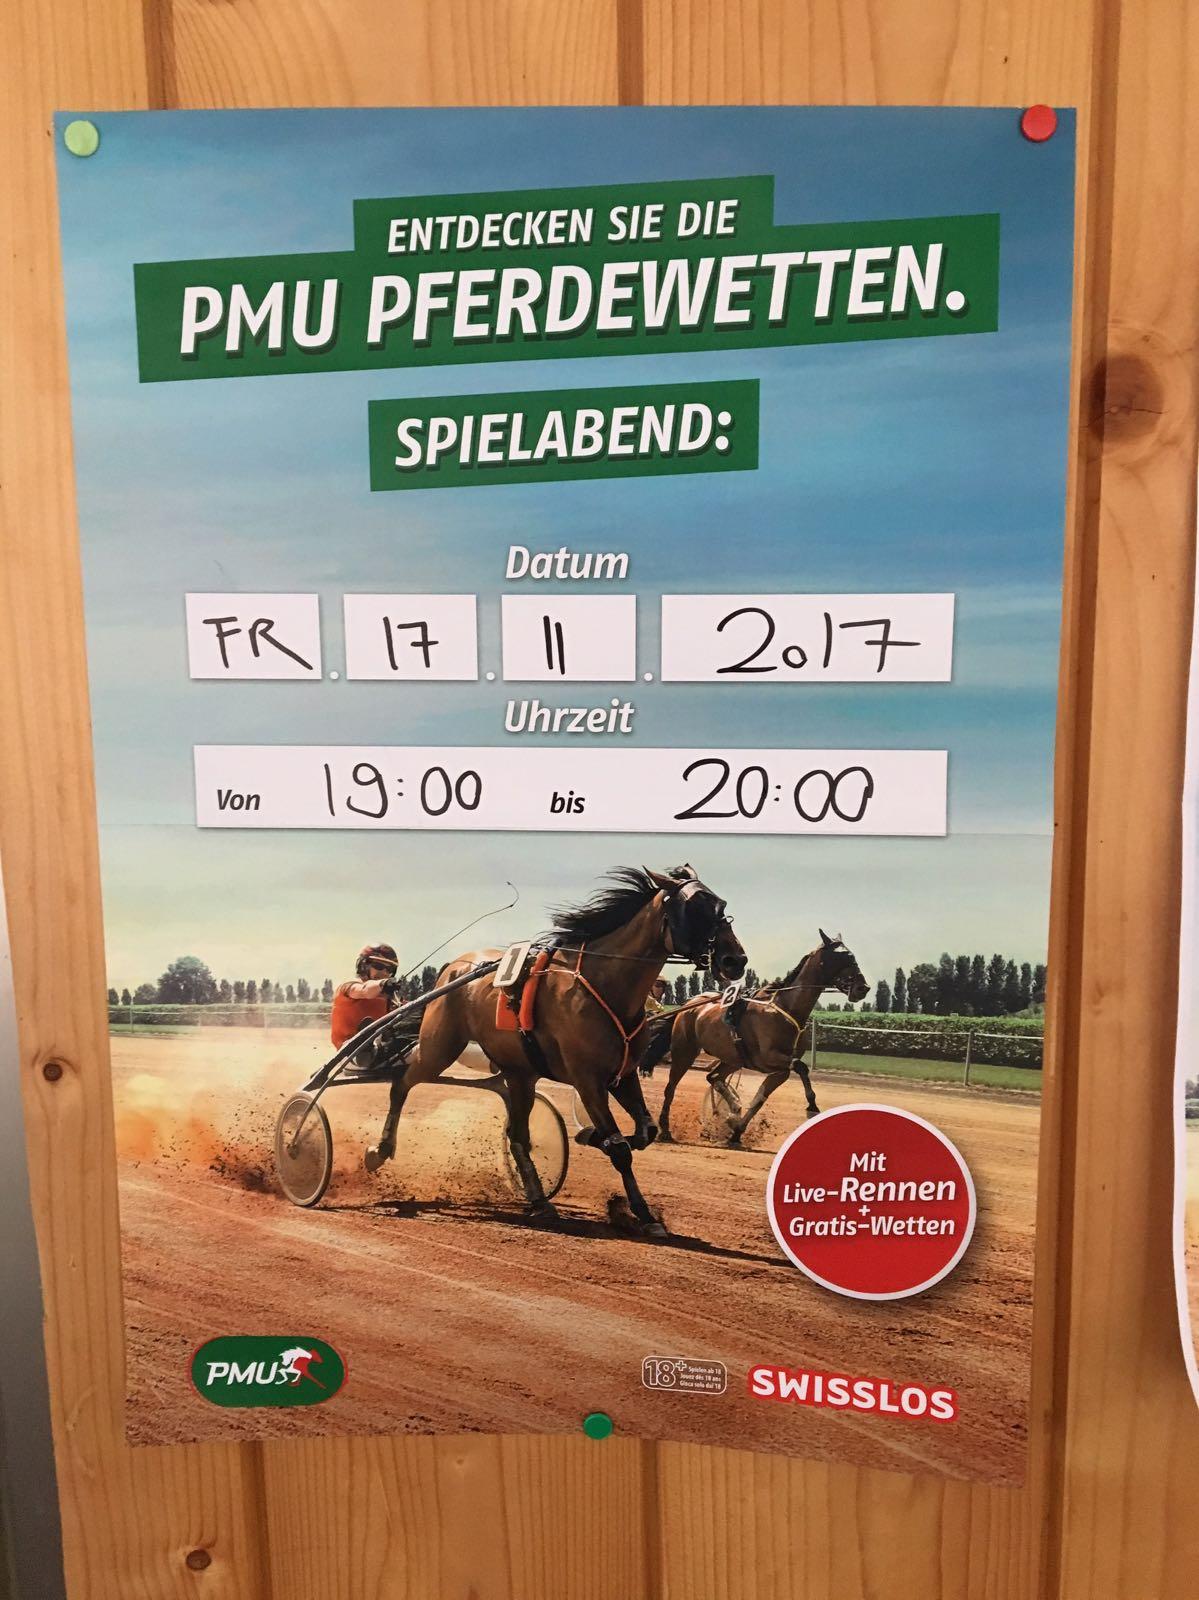 PMU Pferdewetten